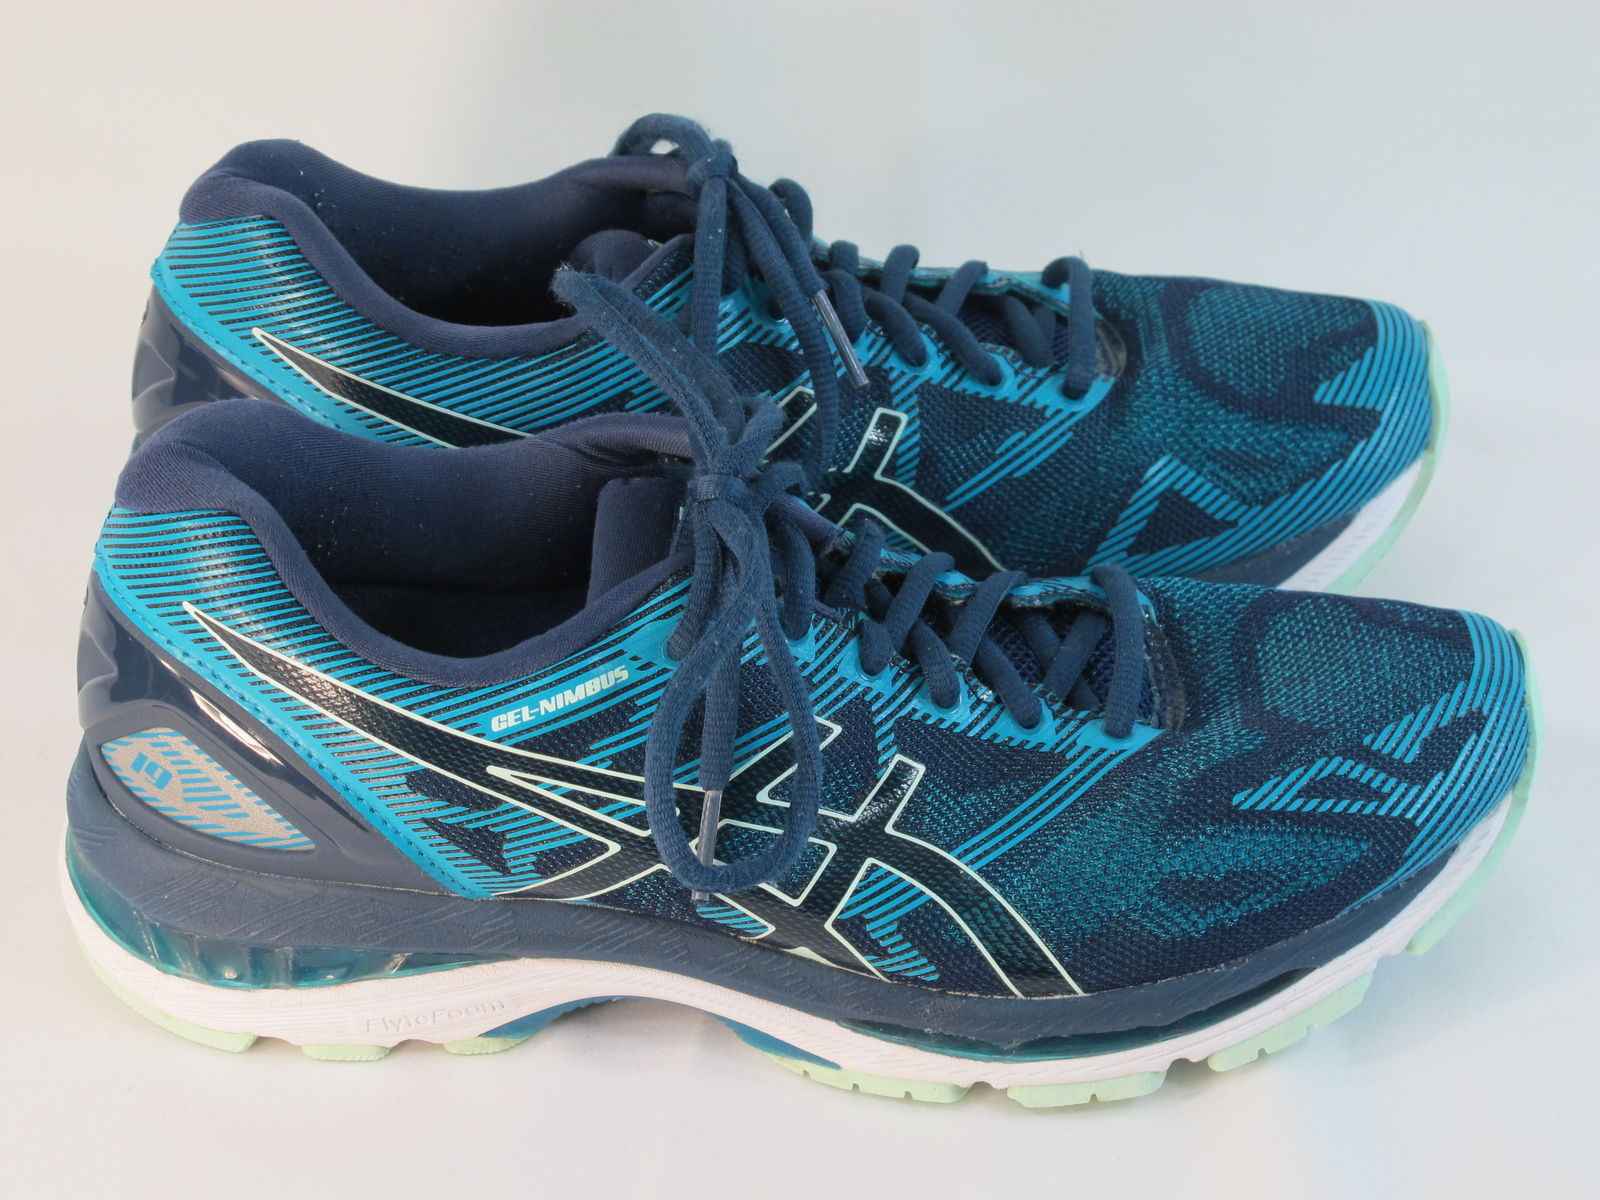 new product c0abd 16428 ASICS Gel Nimbus 19 Running Shoes Women's and 11 similar items